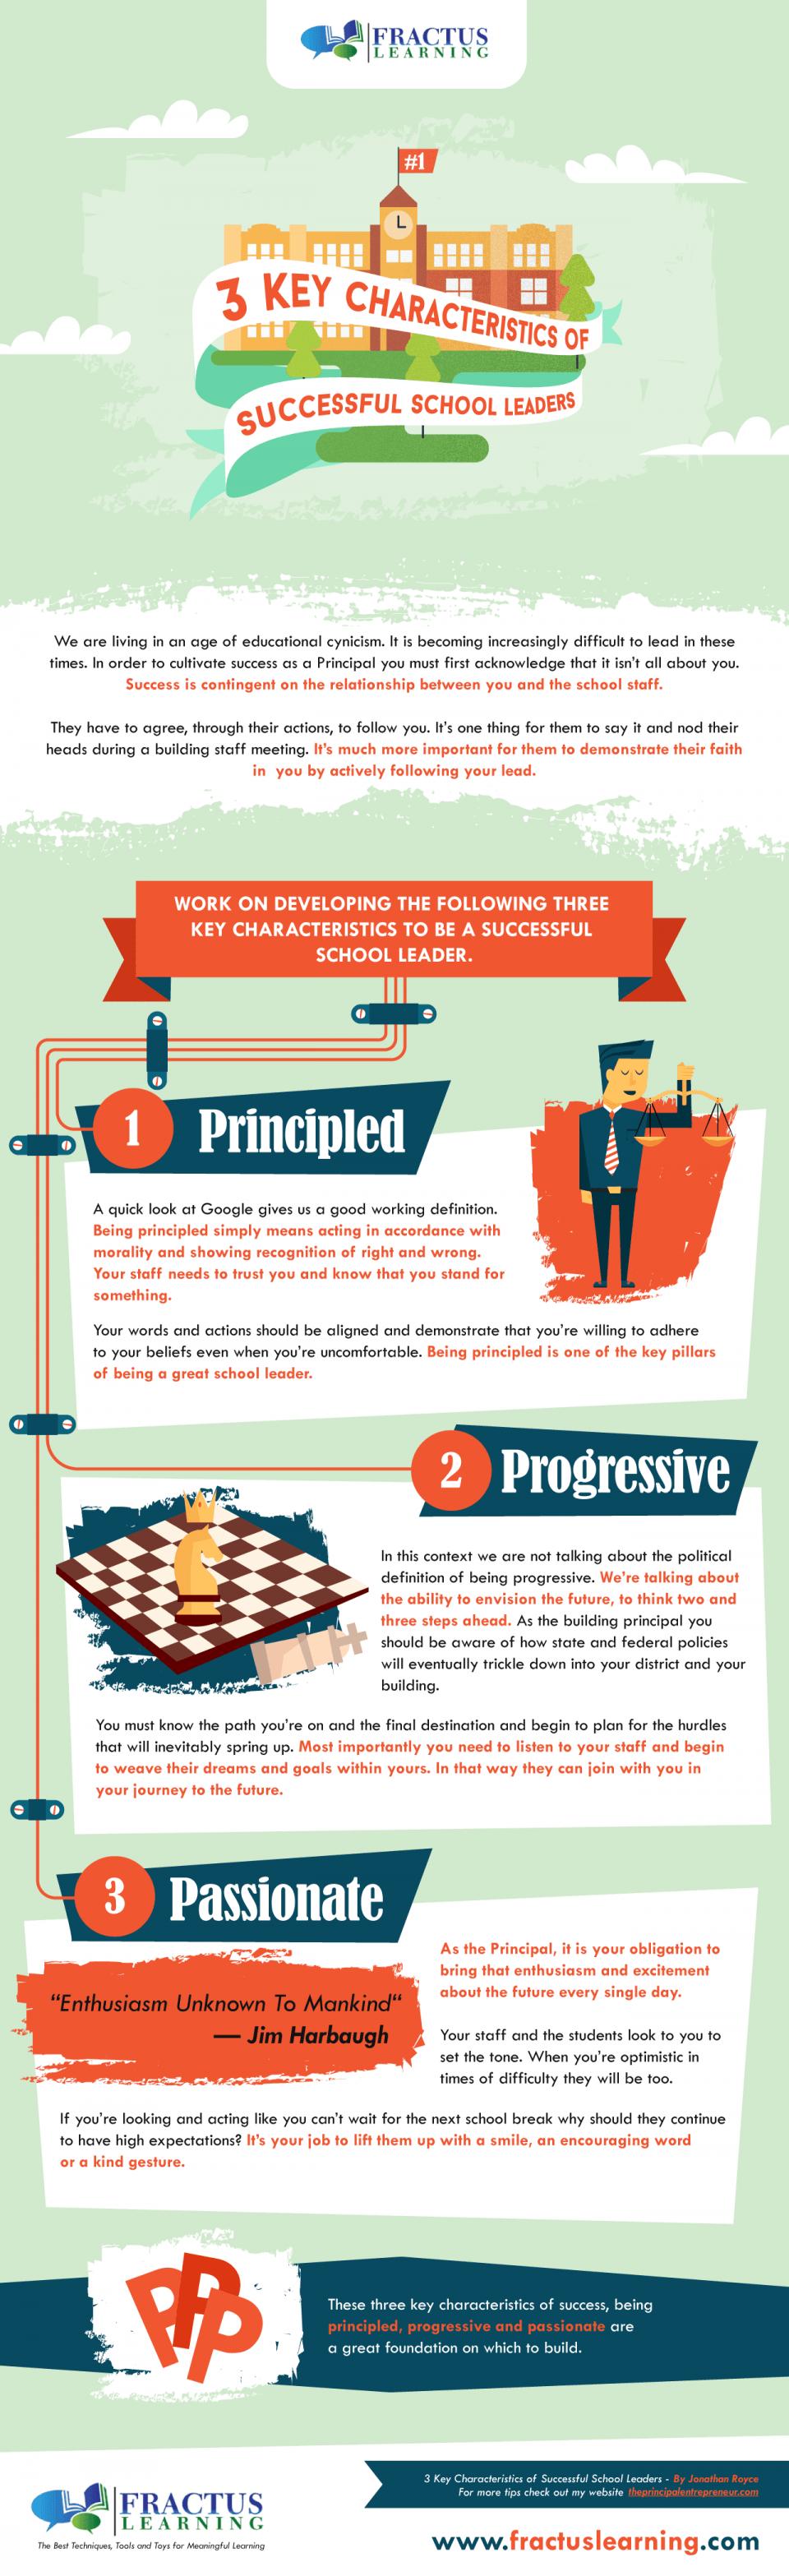 3 Key Characteristics of Successful School Leaders Infographic